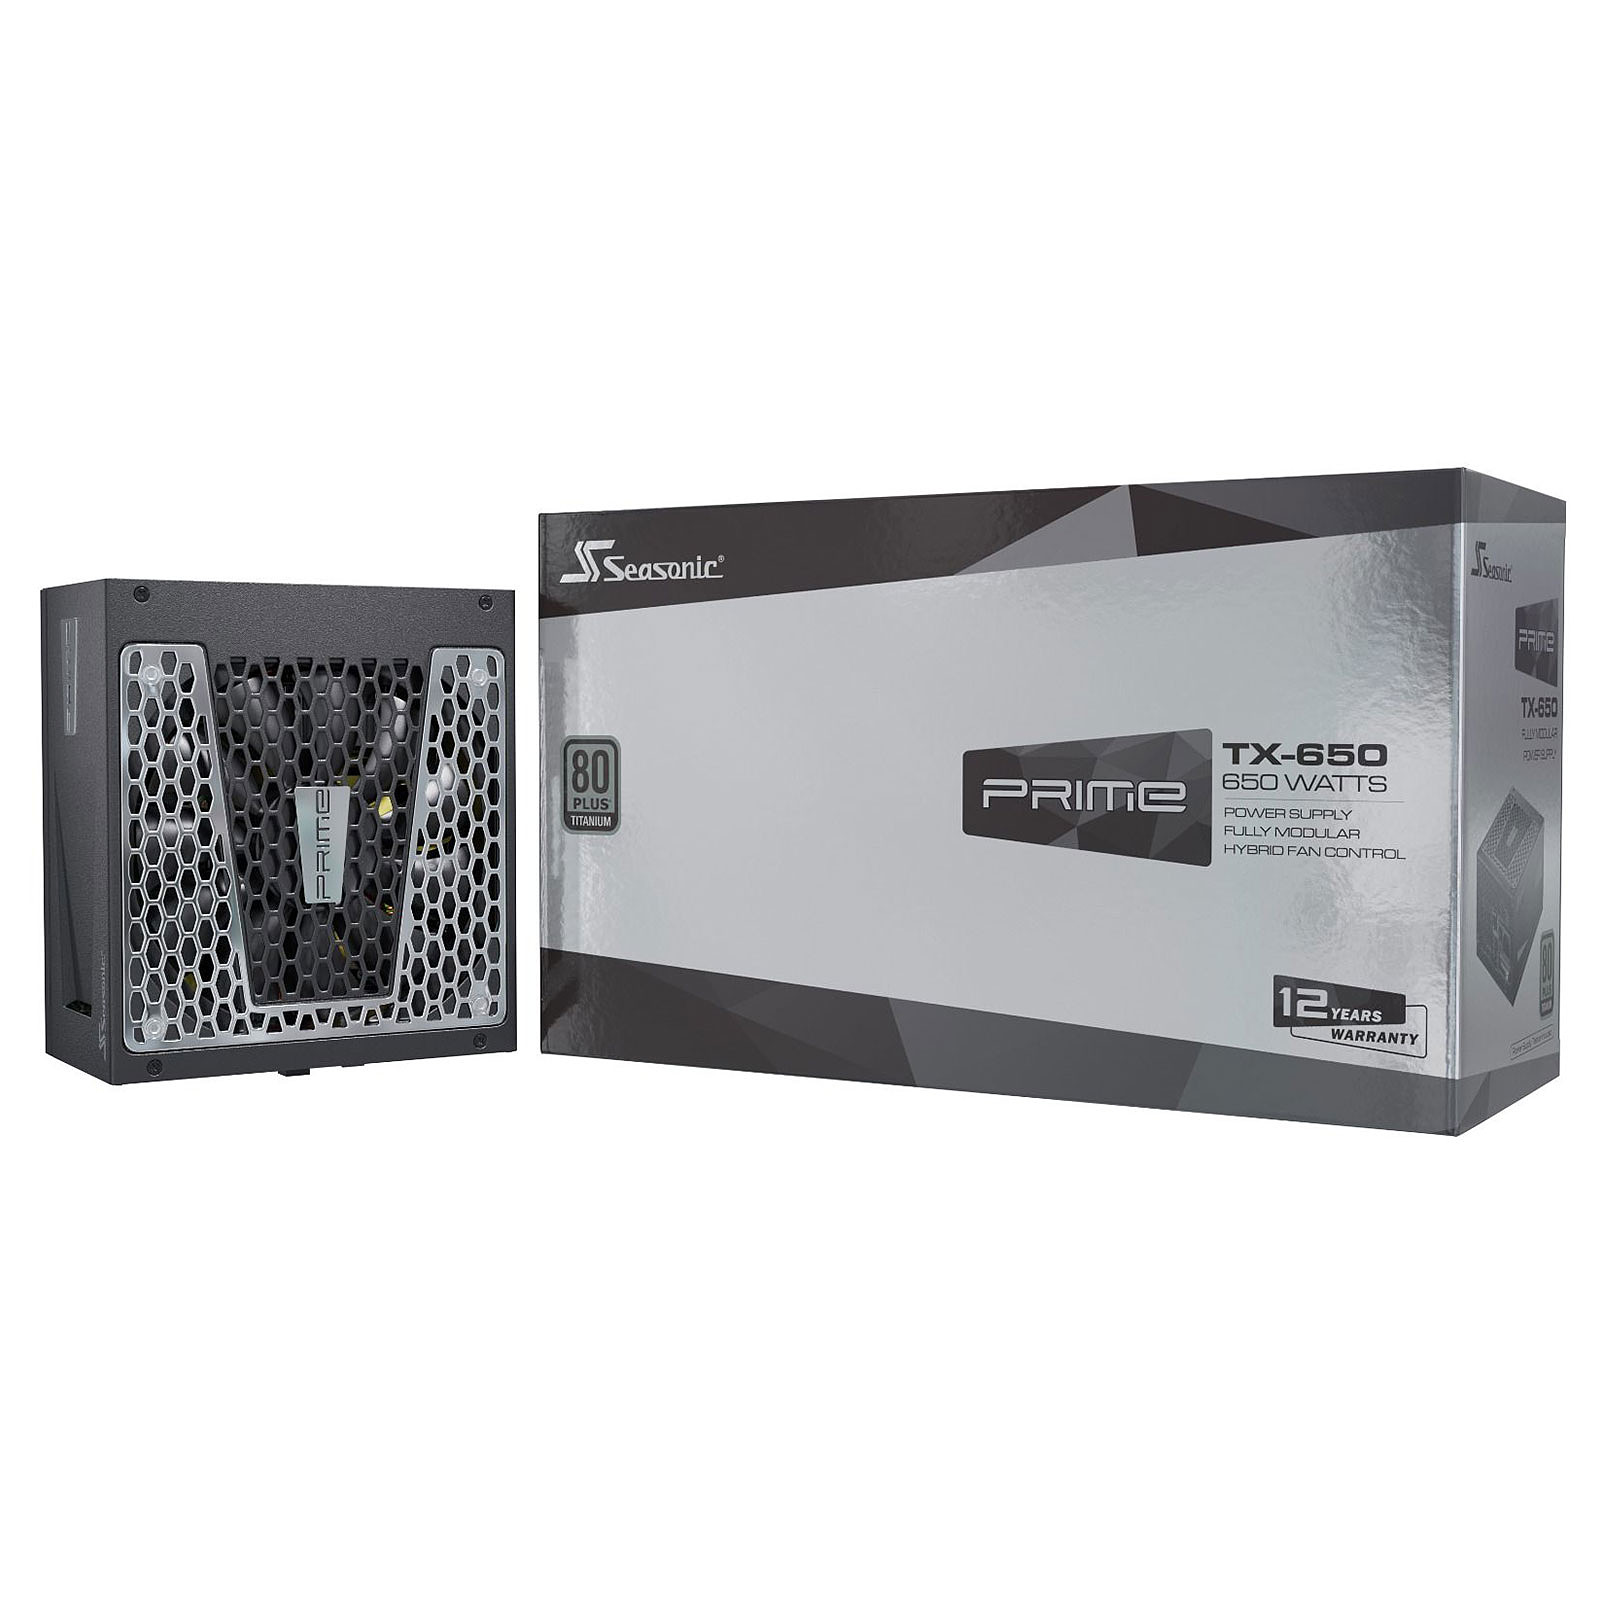 Seasonic PRIME TX-650